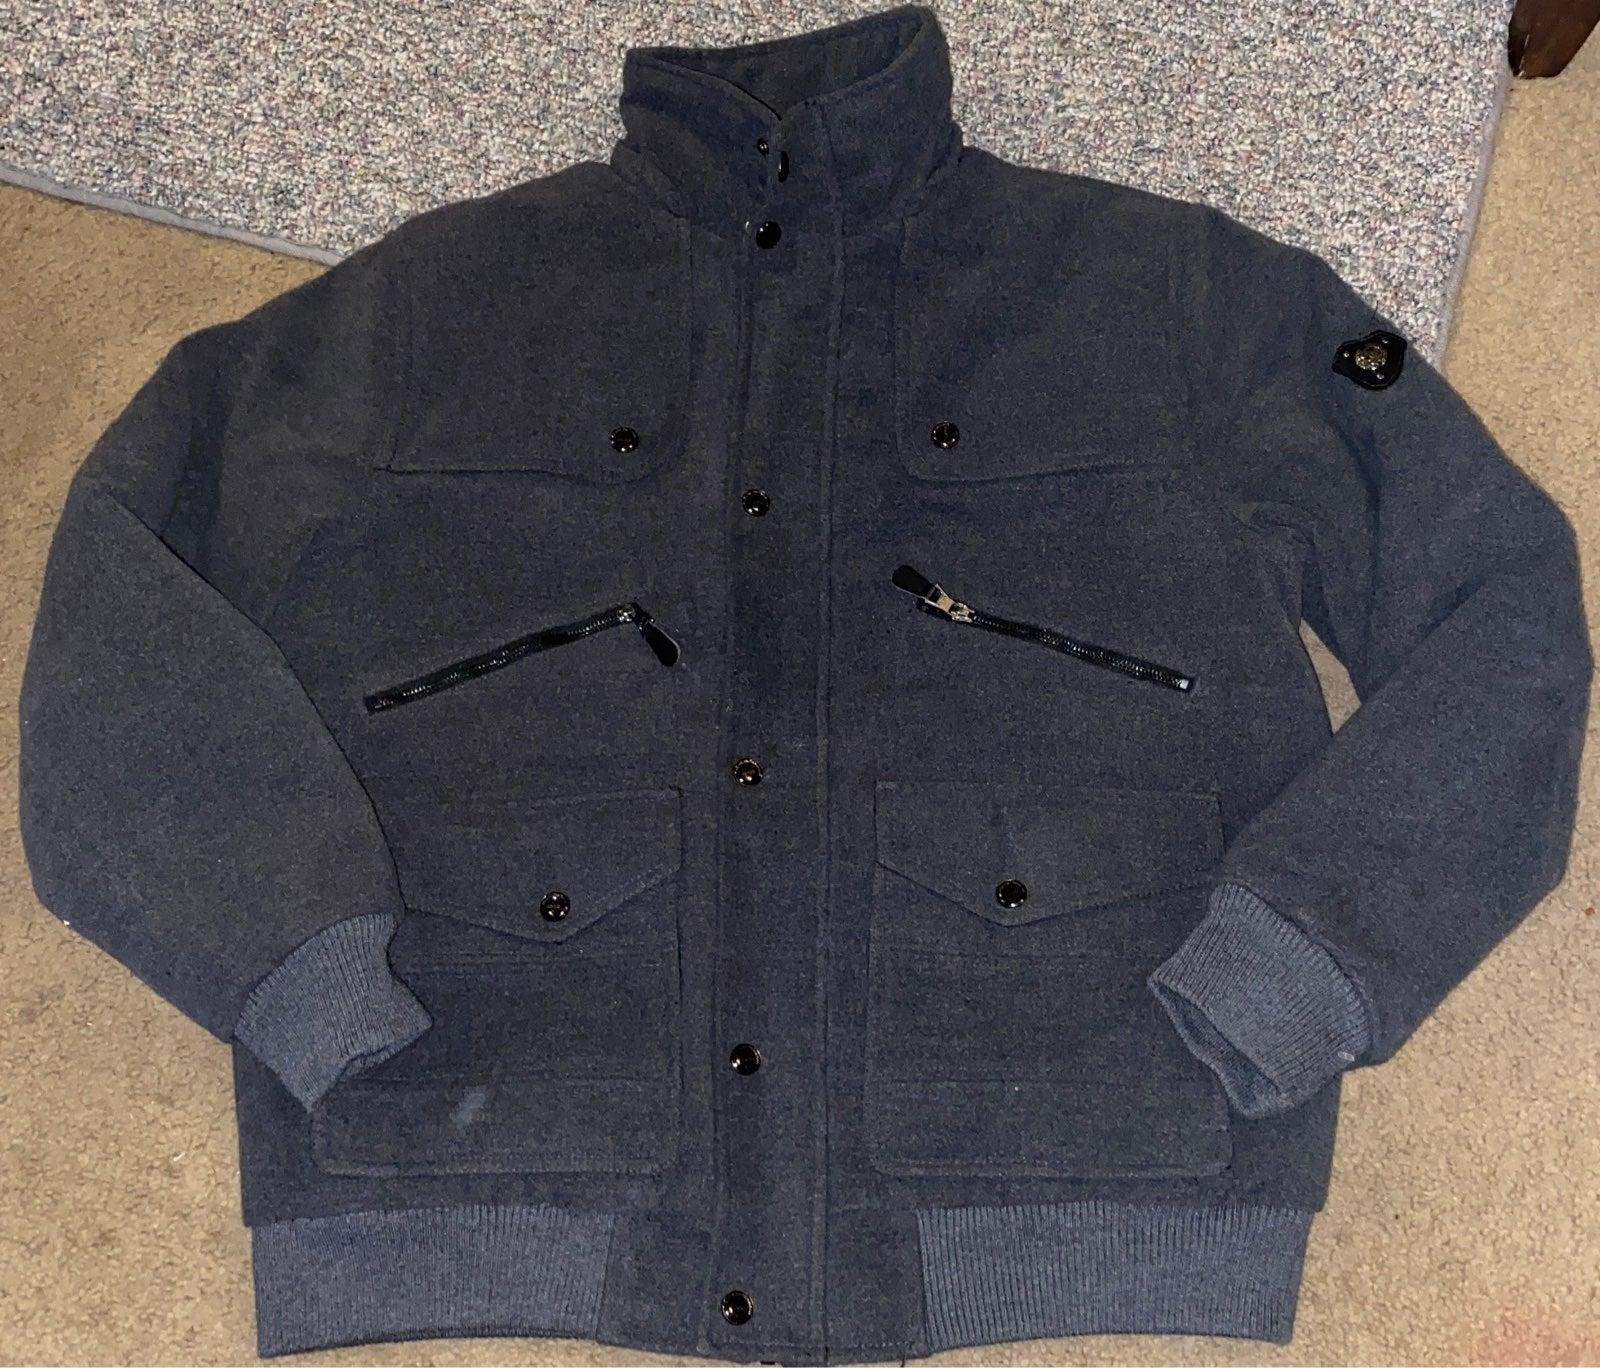 Mens Coogi authintec Outerwear Jacket XL